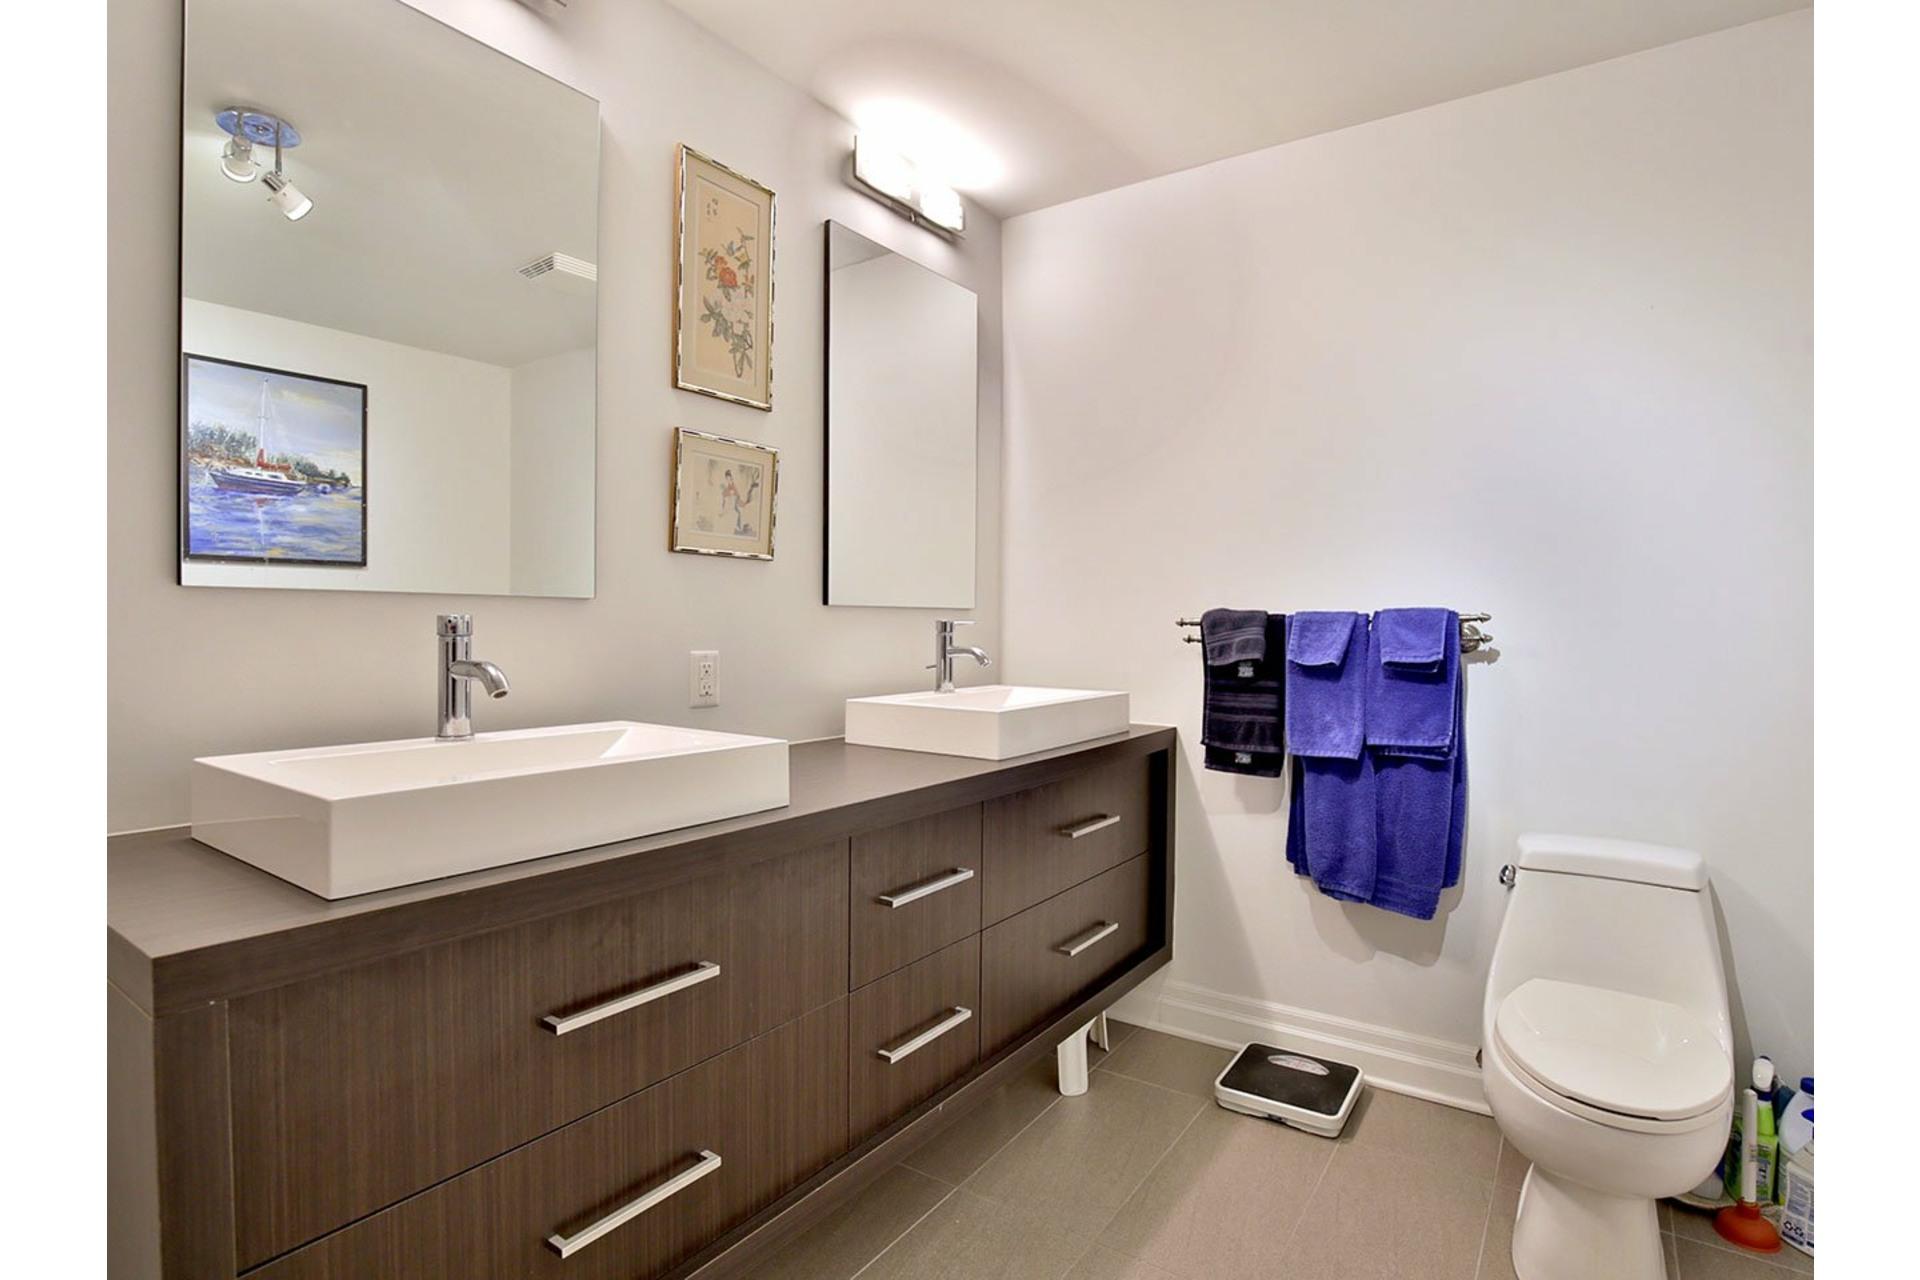 image 18 - Apartment For sale Varennes - 5 rooms